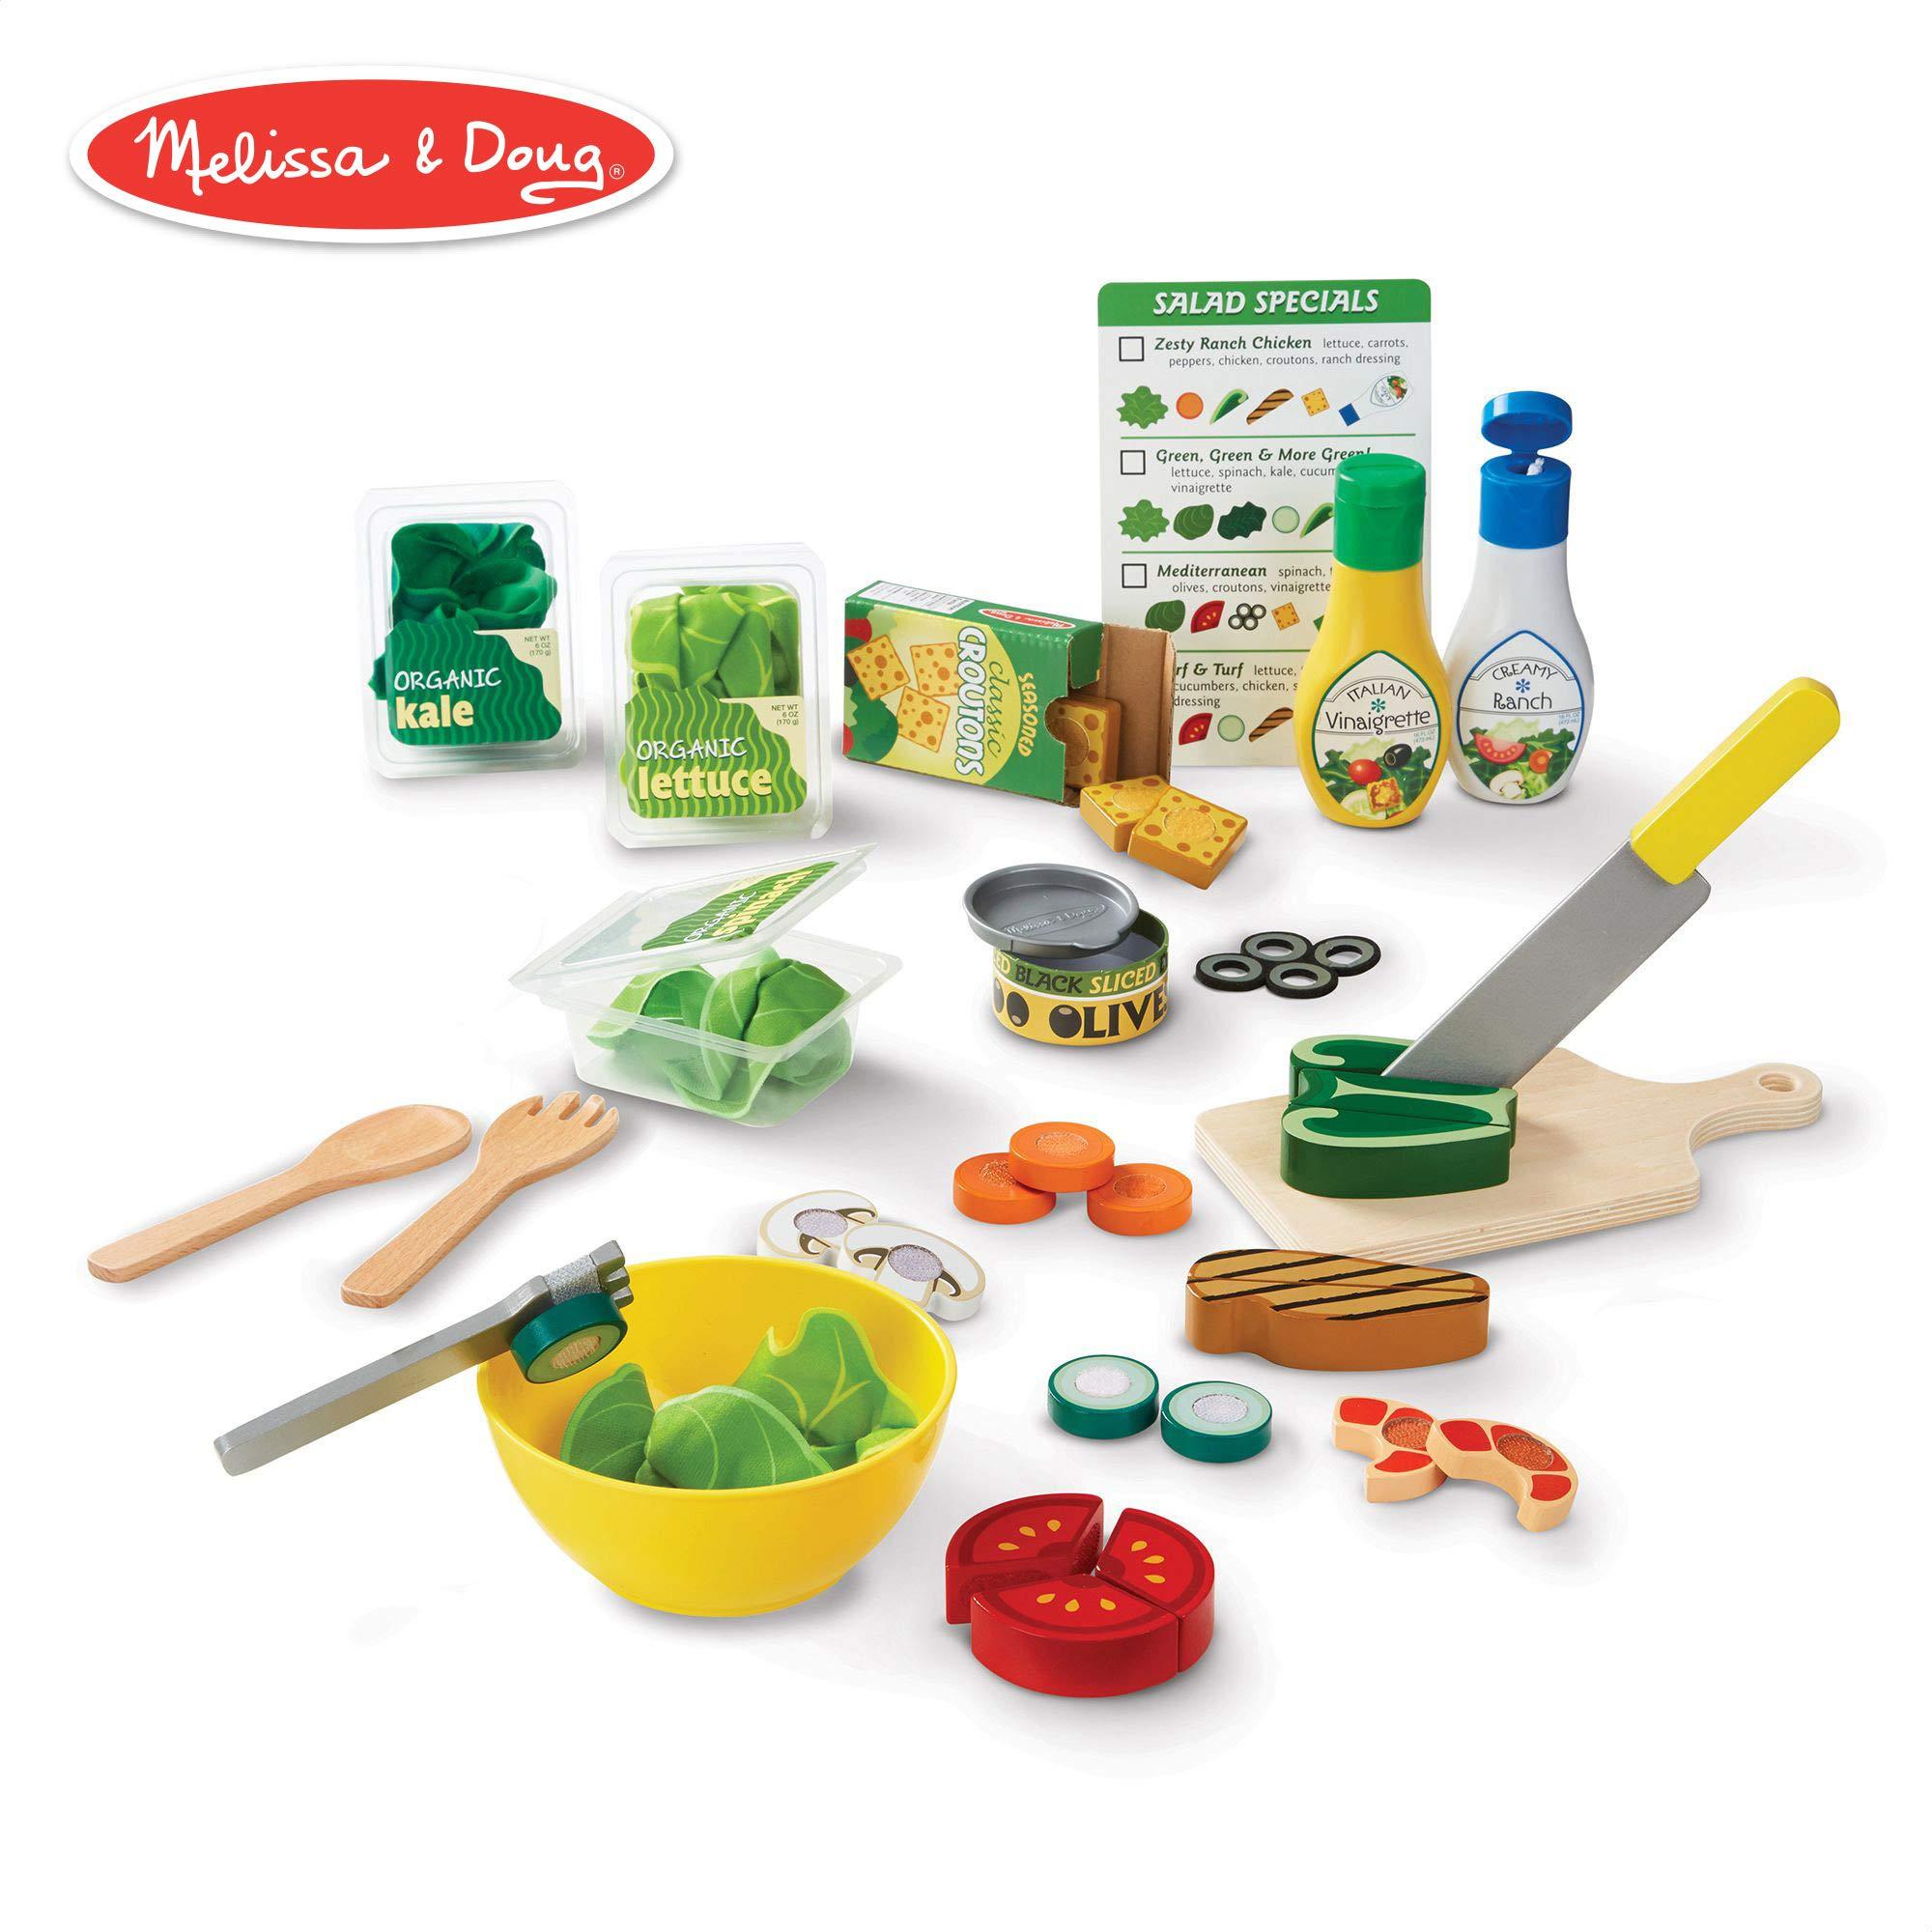 Melissa & Doug Slice & Toss Salad Set (Pretend Play, Self-Stick Tabs, Reusable Double-Sided Menu, 52 Pieces, 12″ H × 16″ W × 3.5″ L)